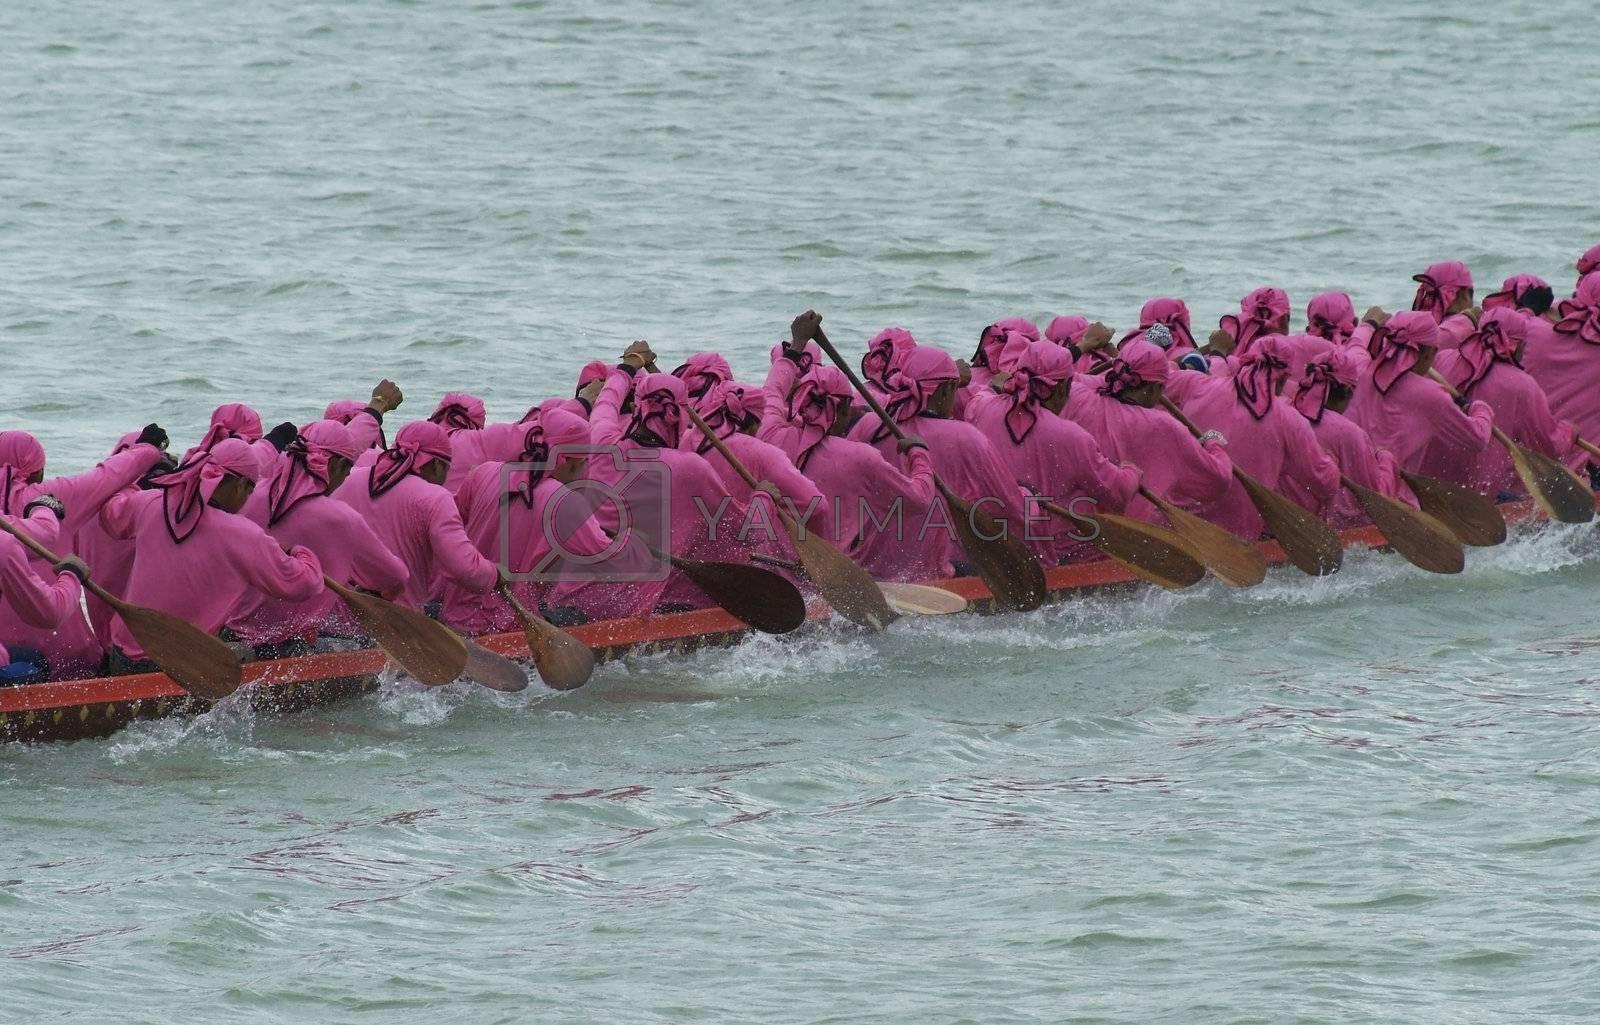 Longboat racing by epixx